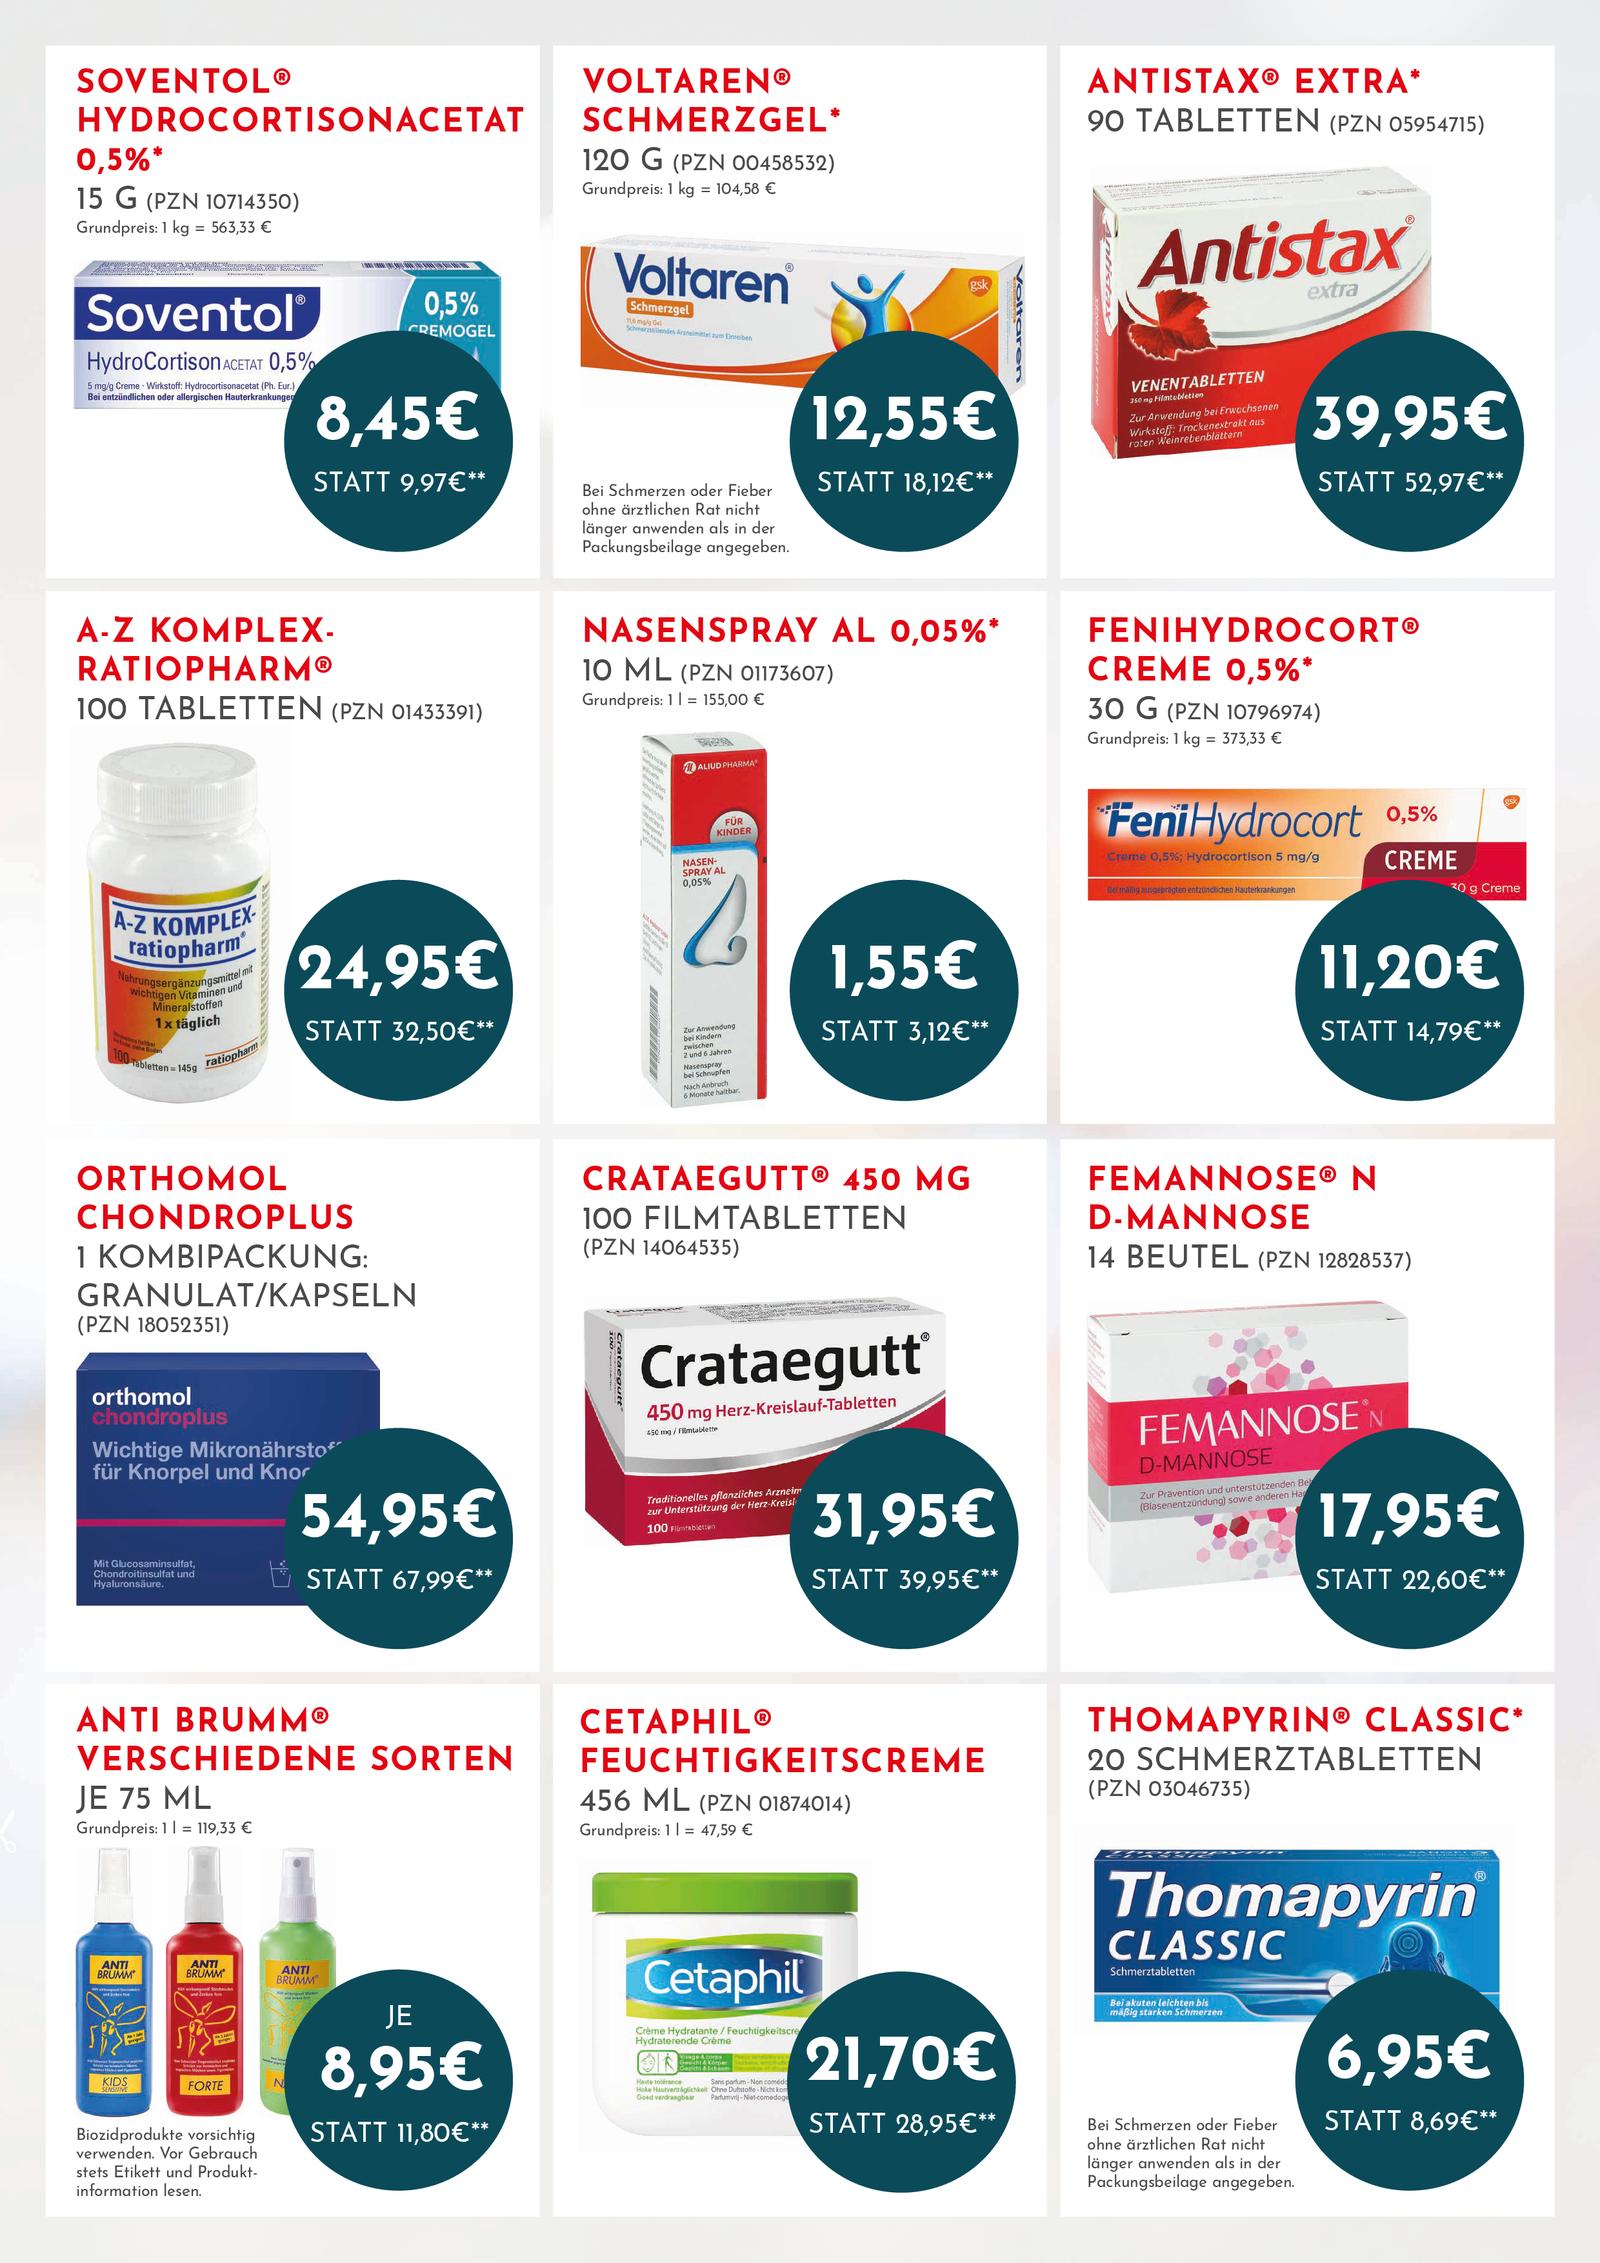 https://mein-uploads.apocdn.net/20354/leaflets/20354_flyer-Seite4.png